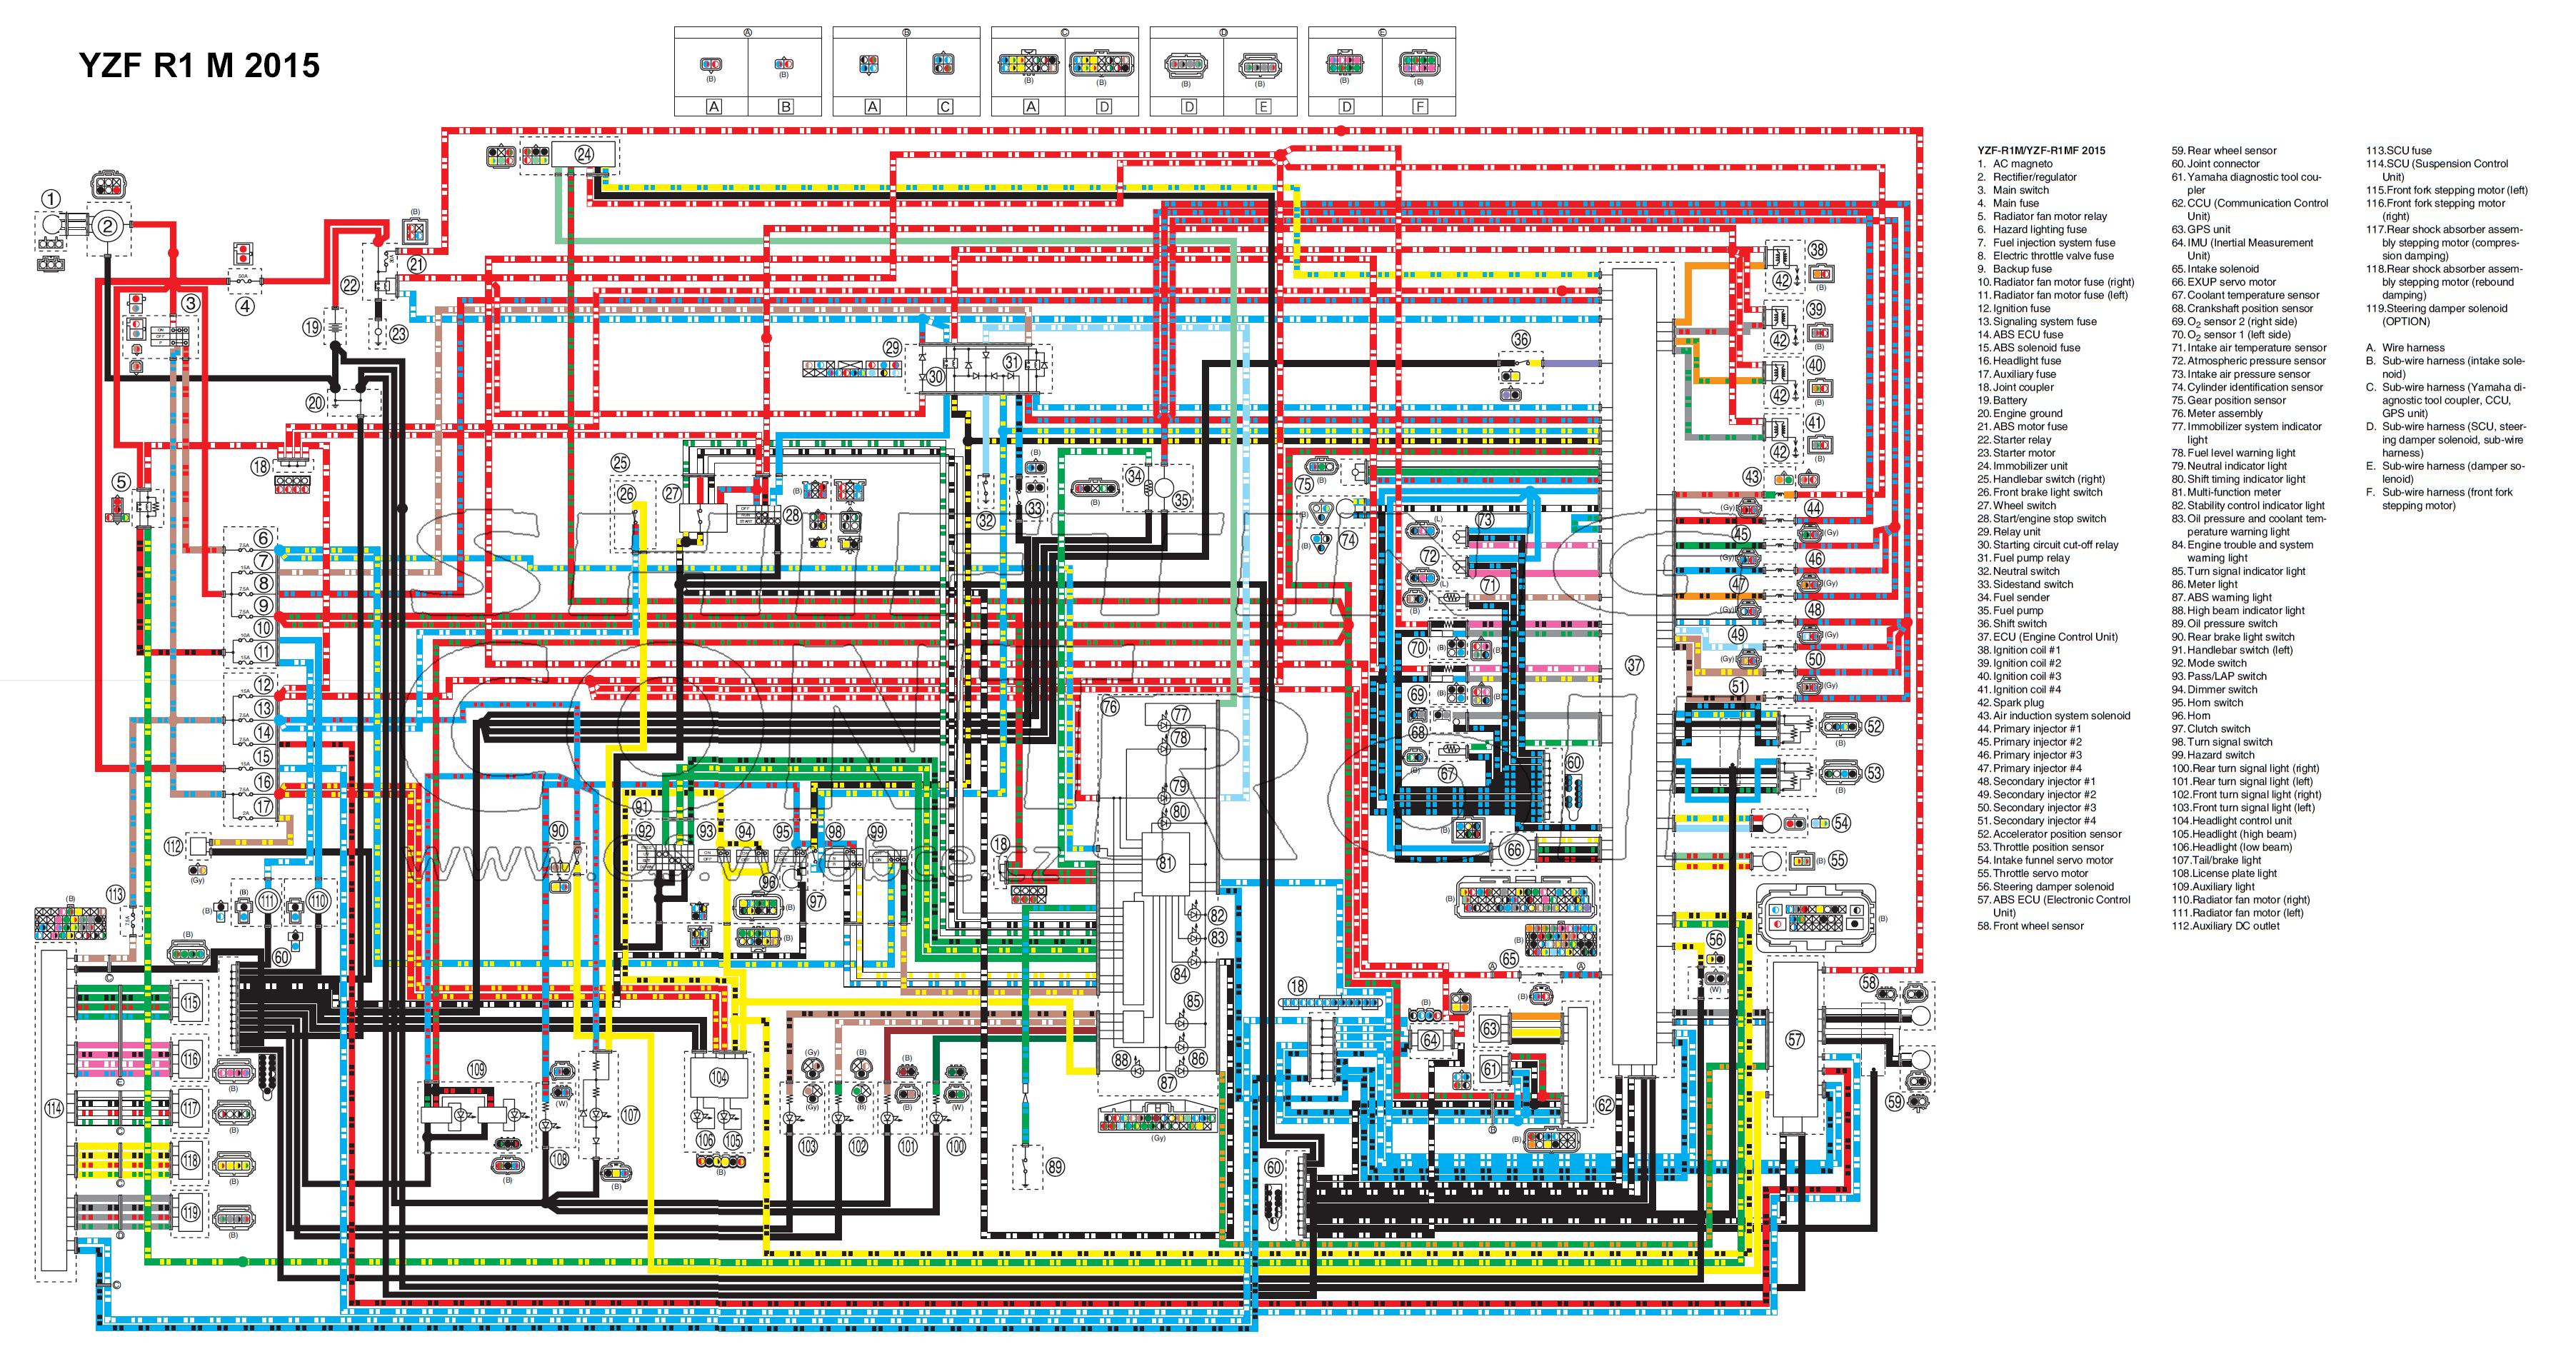 VA_9329] 2006 Yamaha Yzf R1 Wiring Diagram Wiring DiagramEtic Aeocy Tixat Mohammedshrine Librar Wiring 101